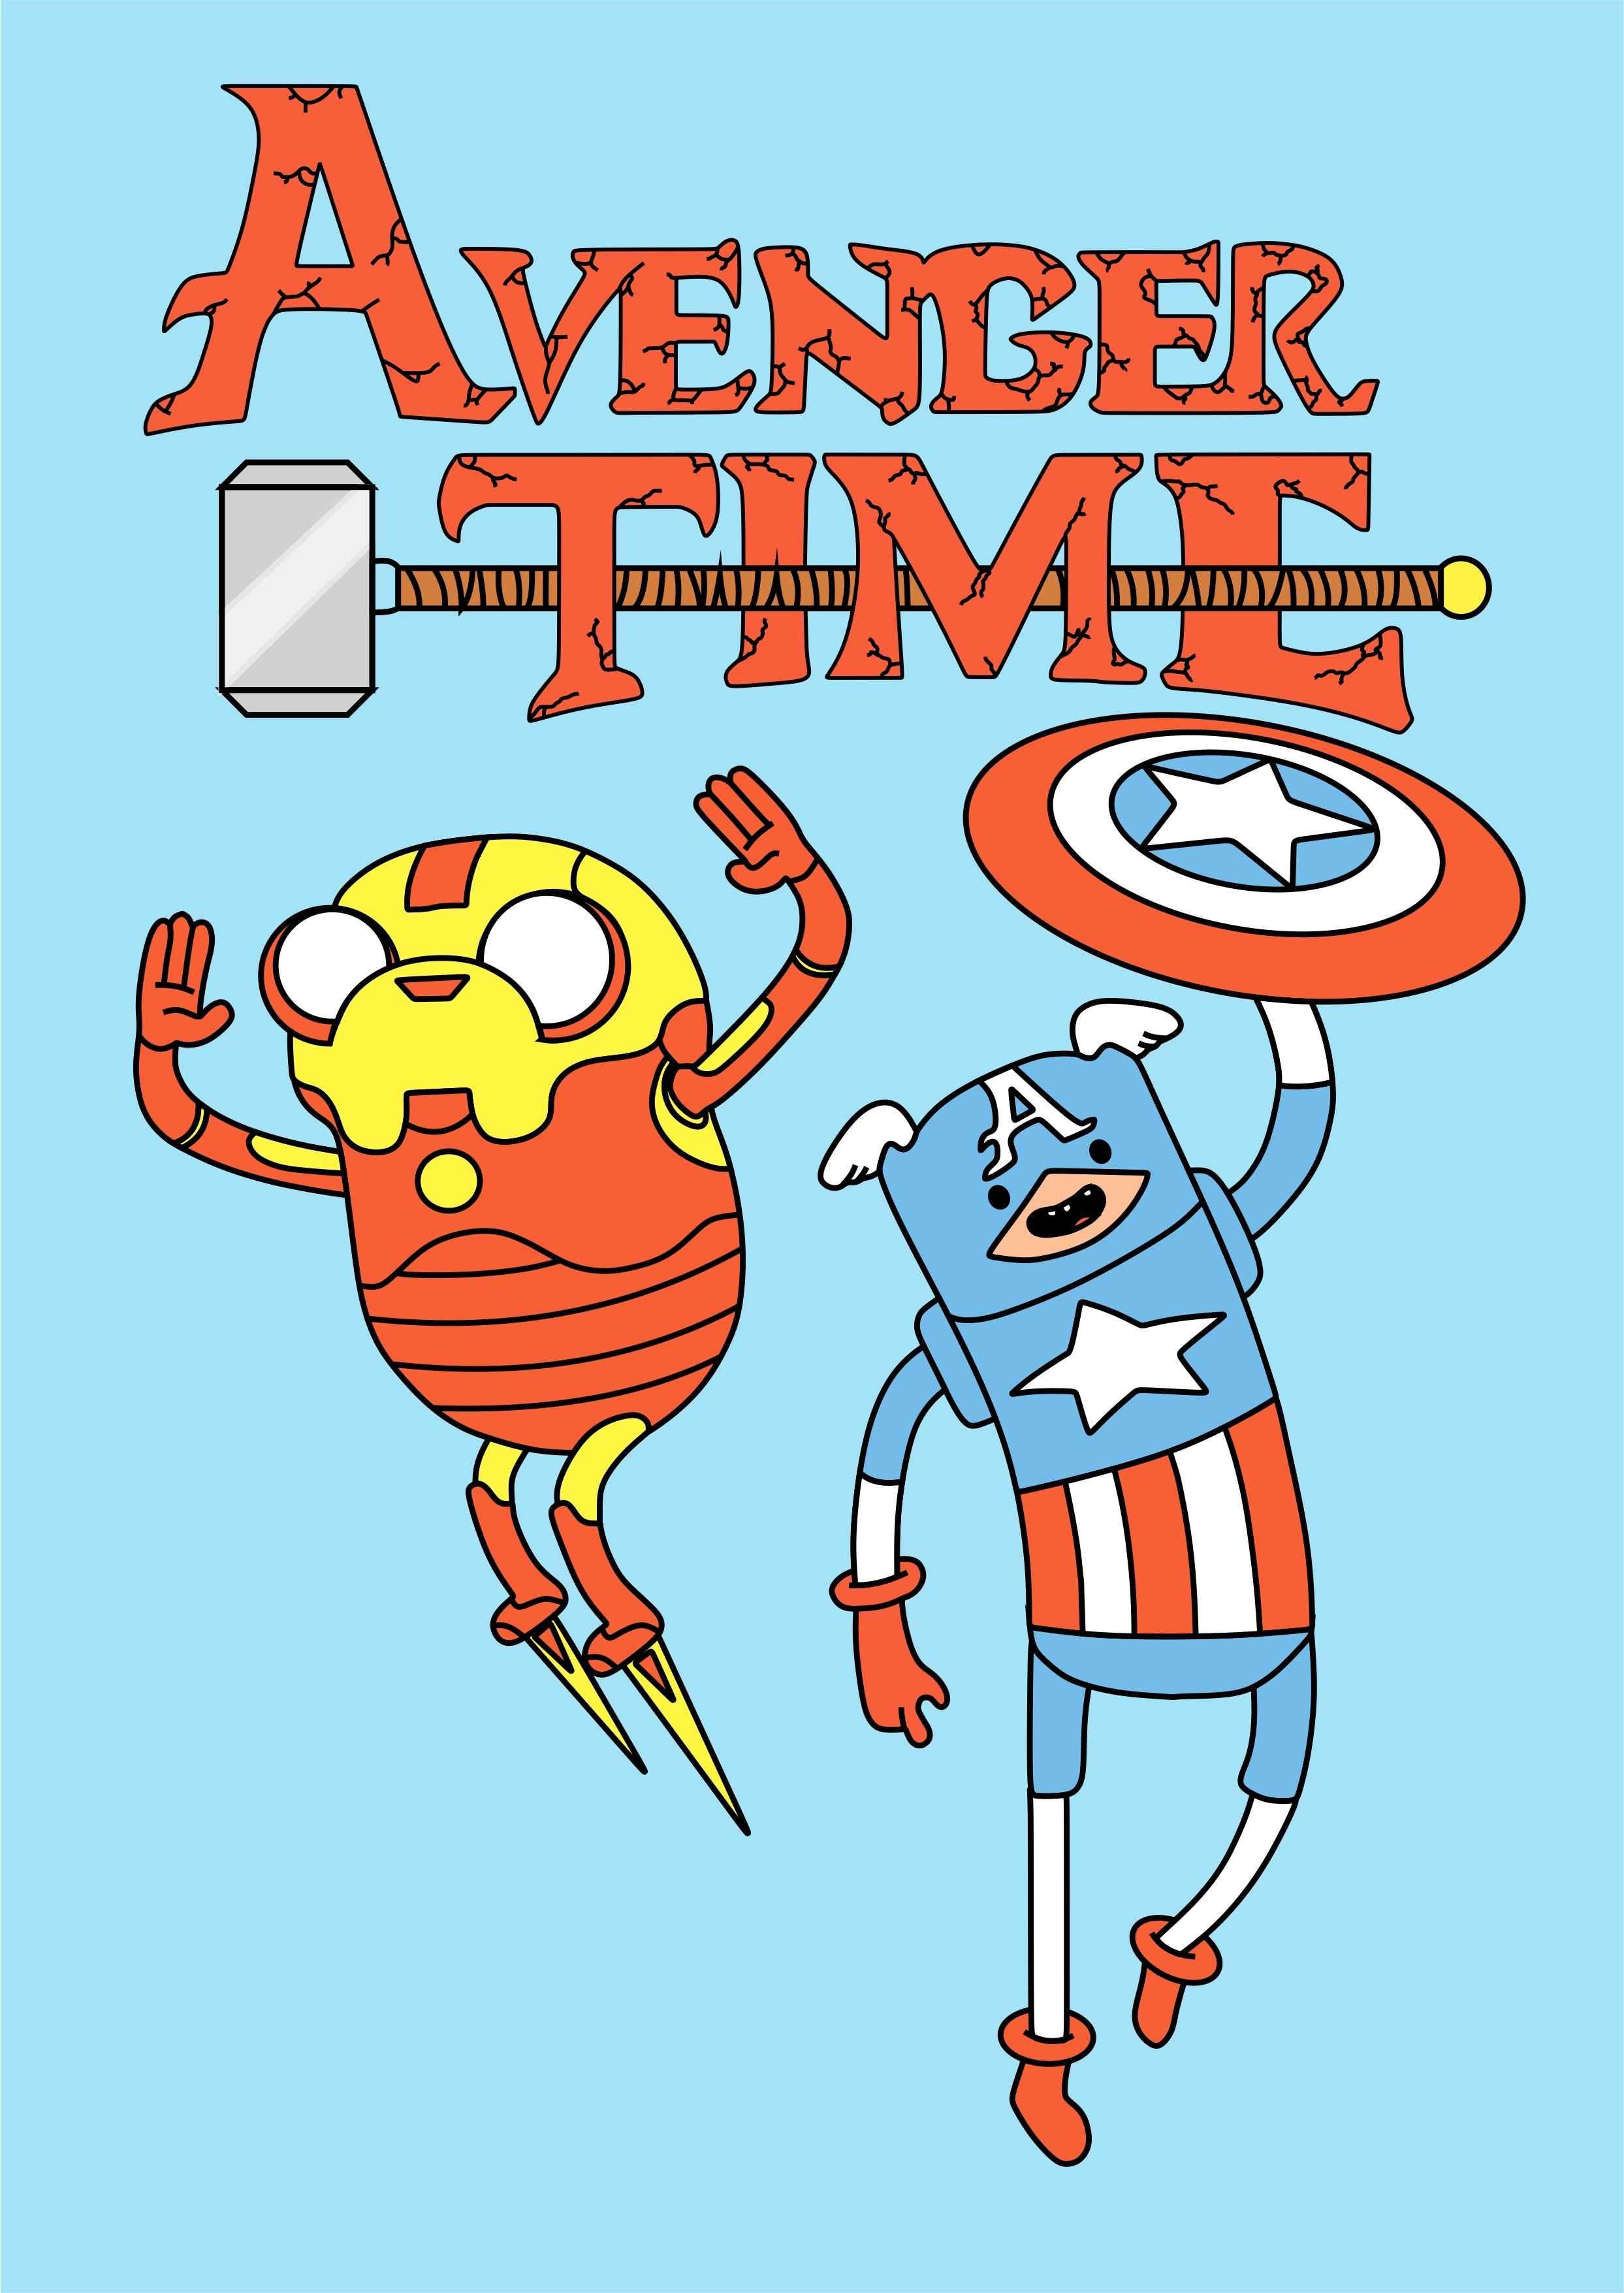 Imagens da Hora da Aventura Avenger Time